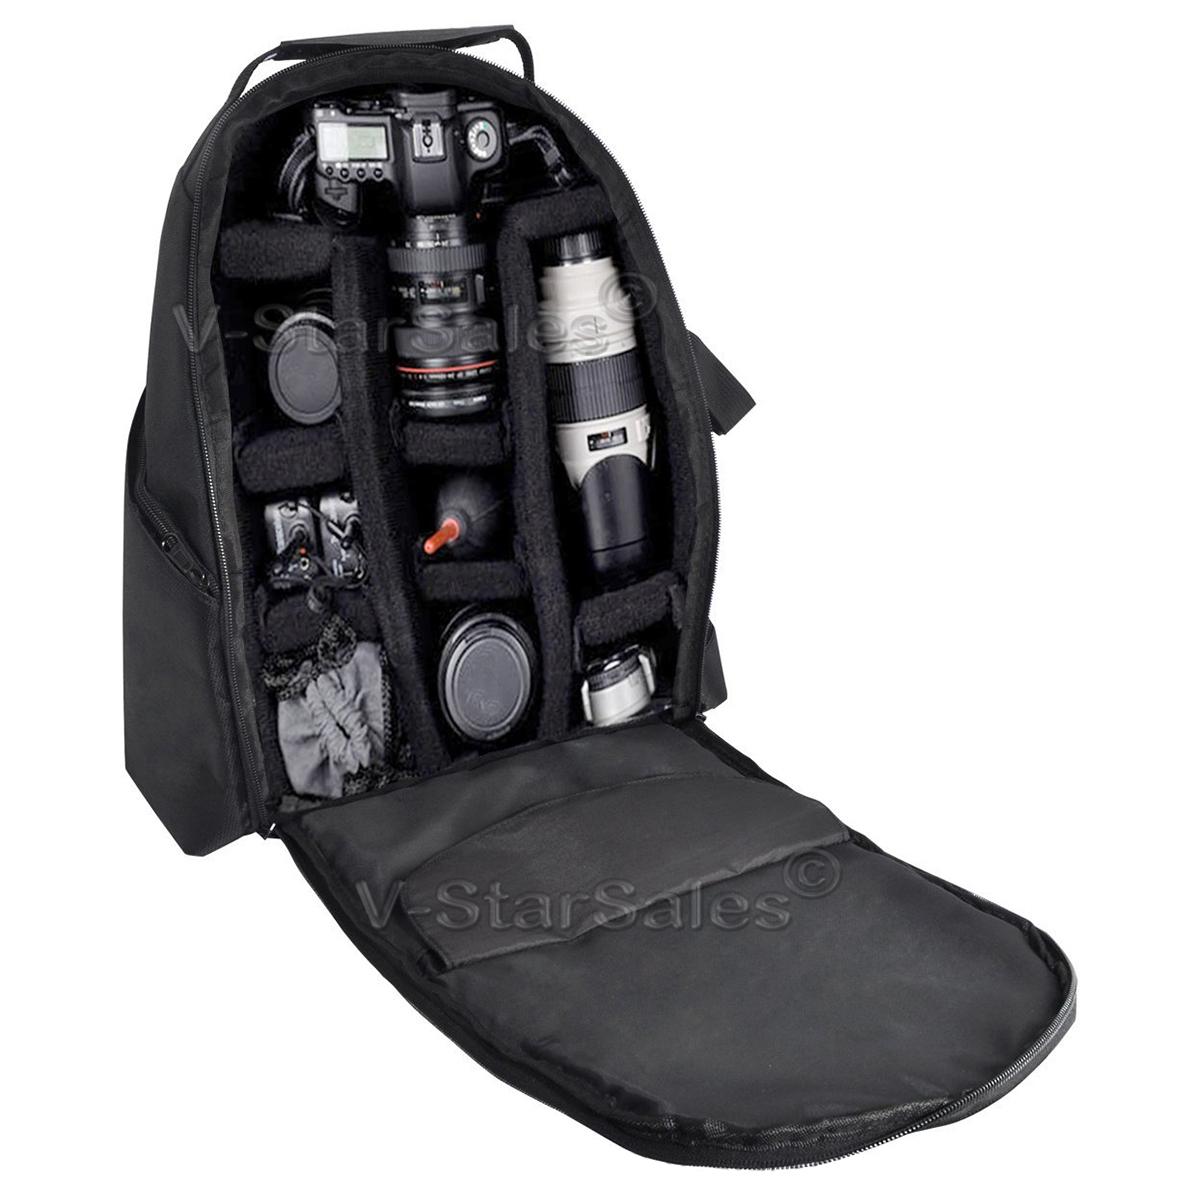 XIT XTBP Deluxe Backpack for Nikon D3100 D3200 D5100 D5200 D7000 D7100